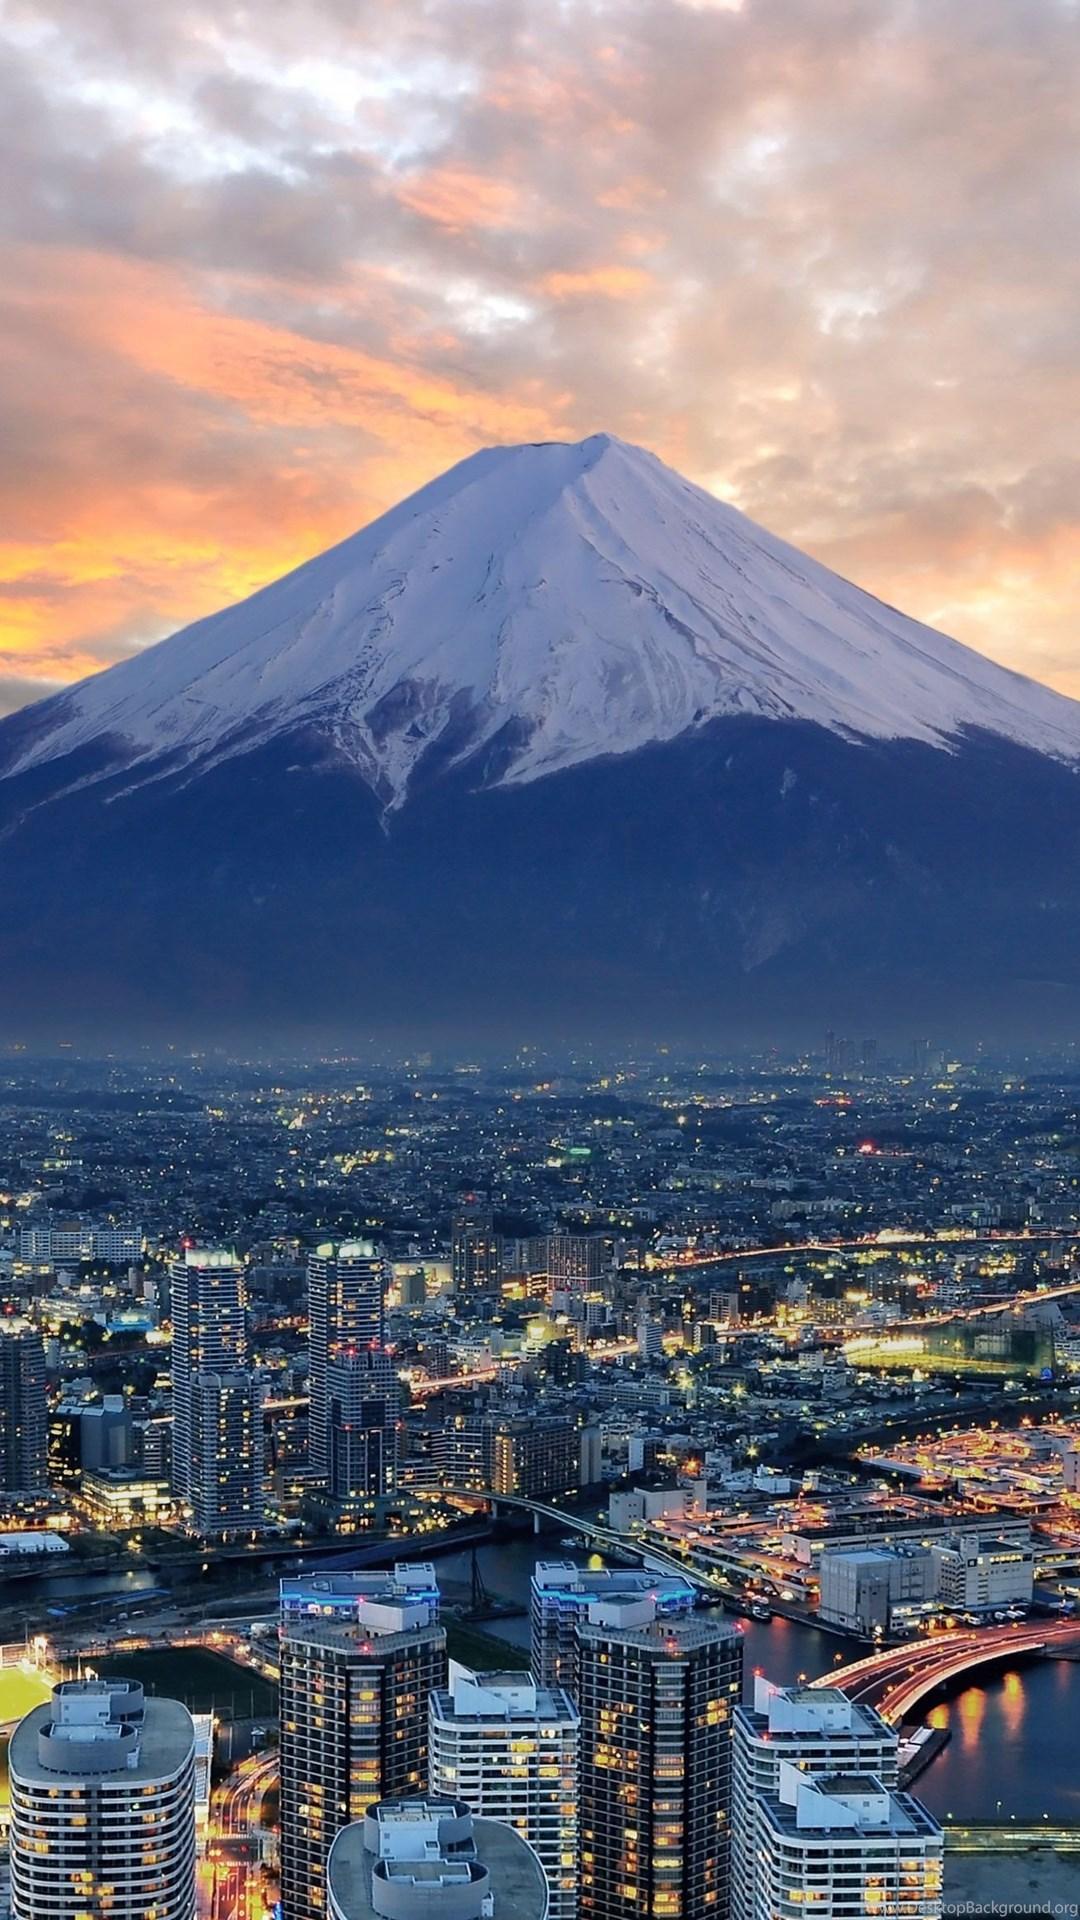 19 Best Amazing HD Japan Mountains Wallpapers Yoanu.com ...